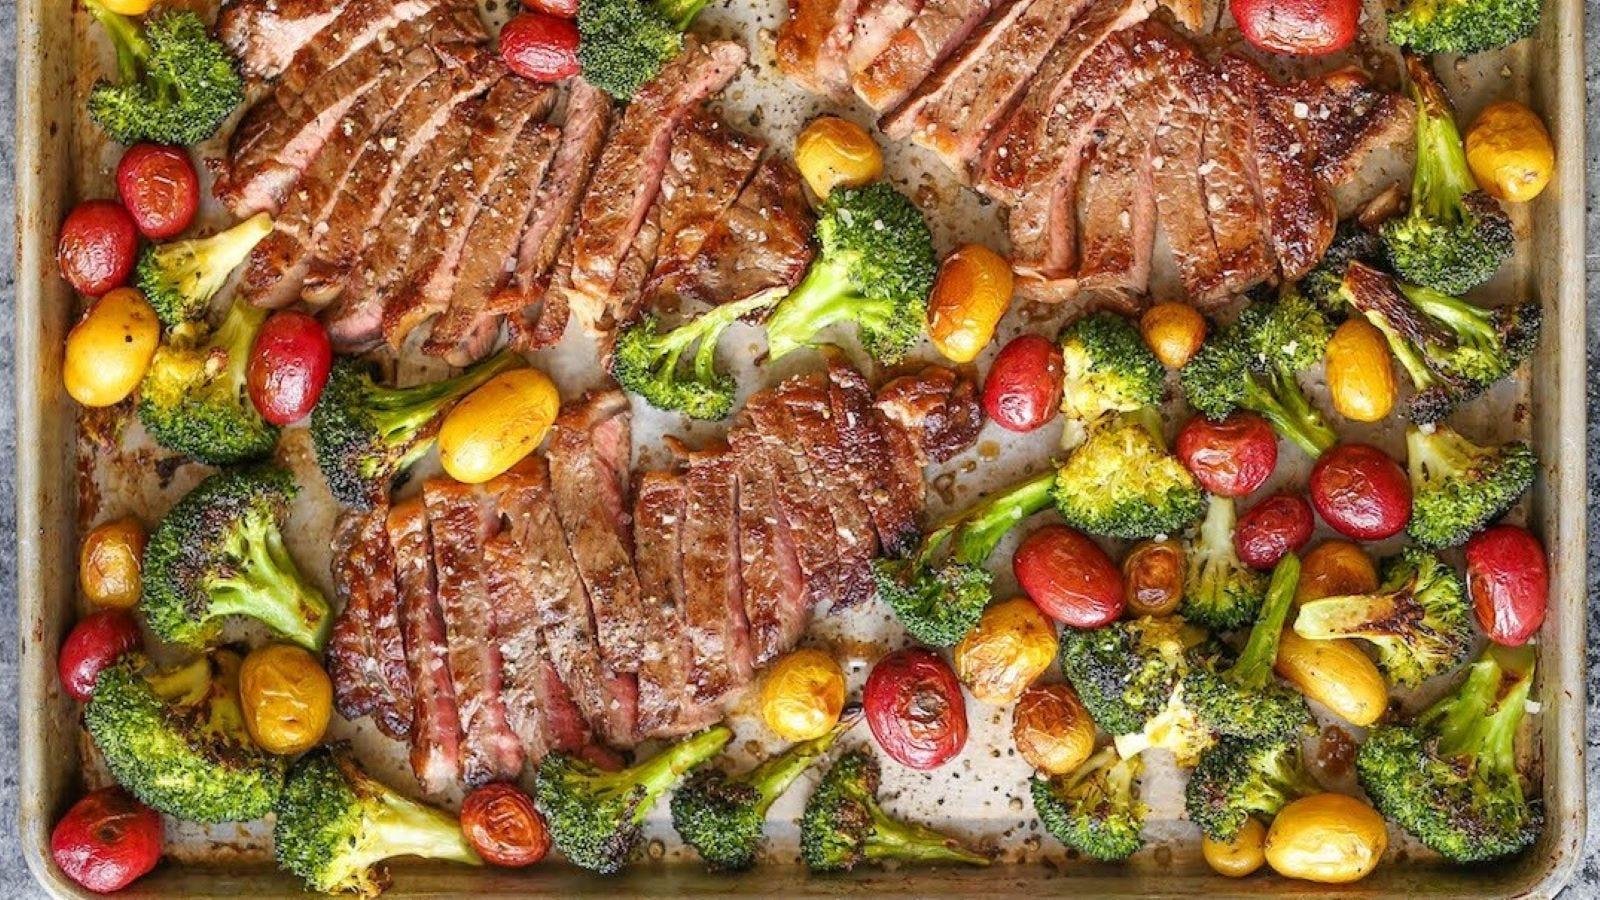 A sheet pan full of steak and veggies.